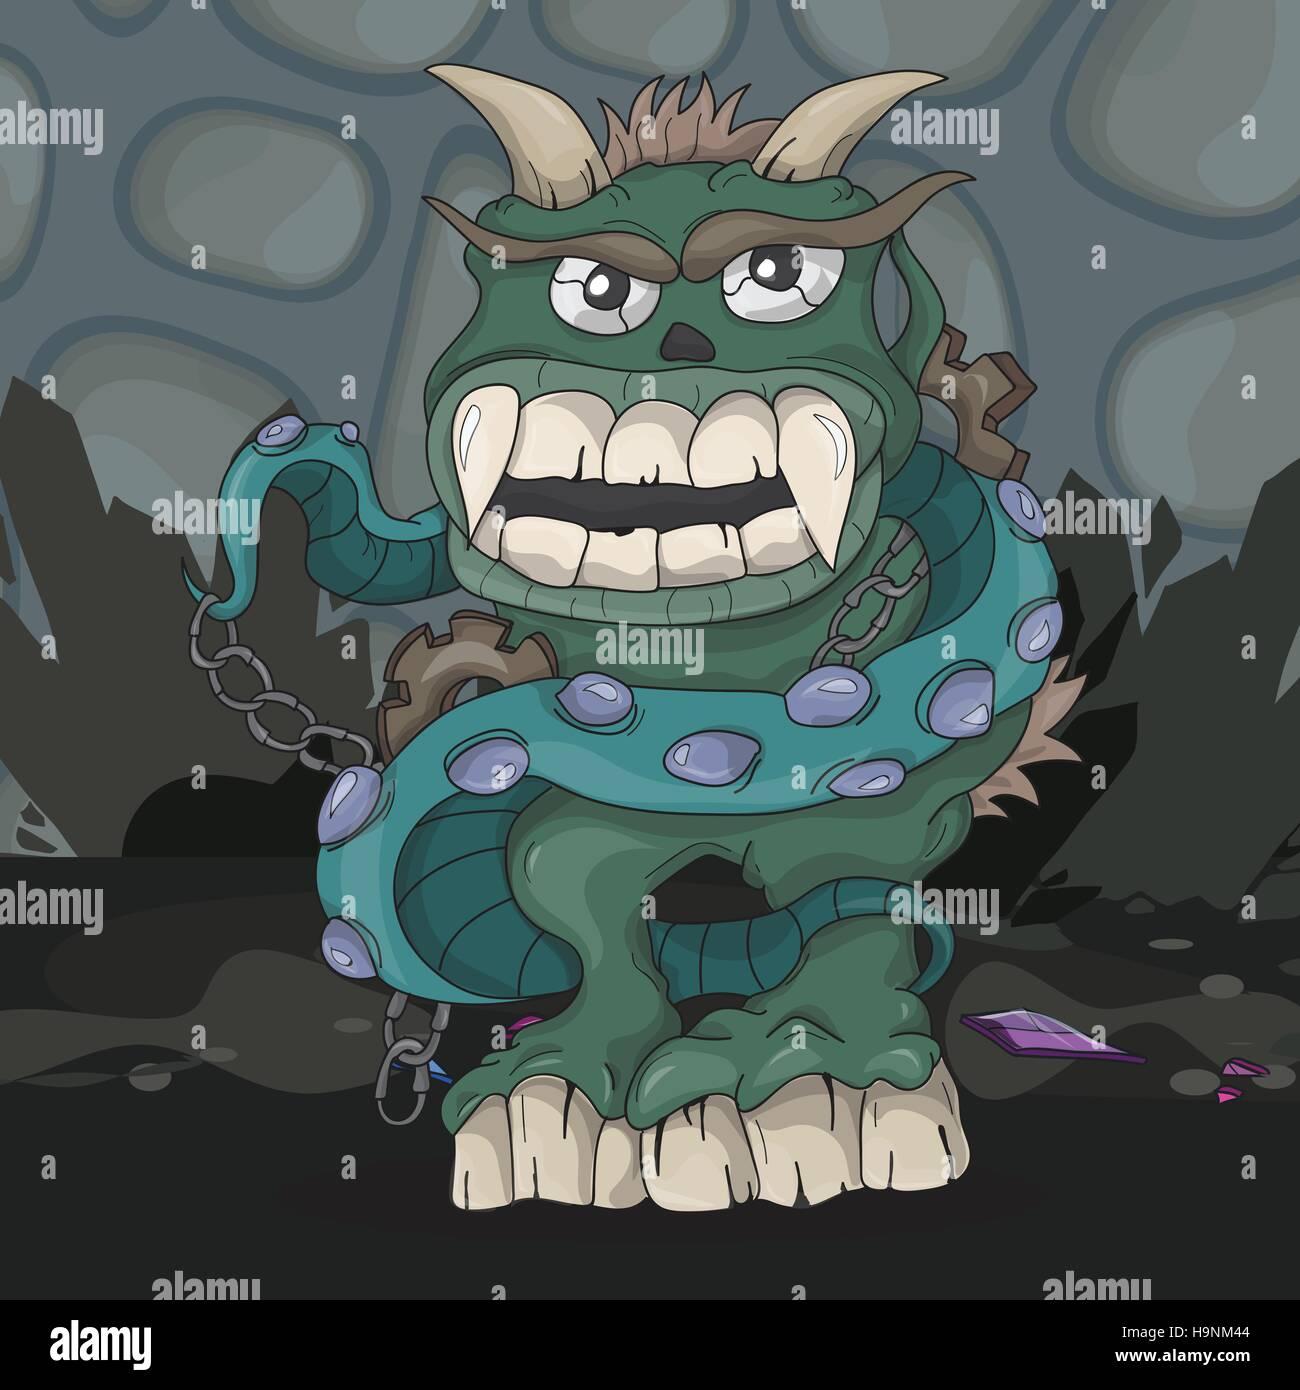 Angry cartoon dark monster underground -Vector illustration - Stock Image